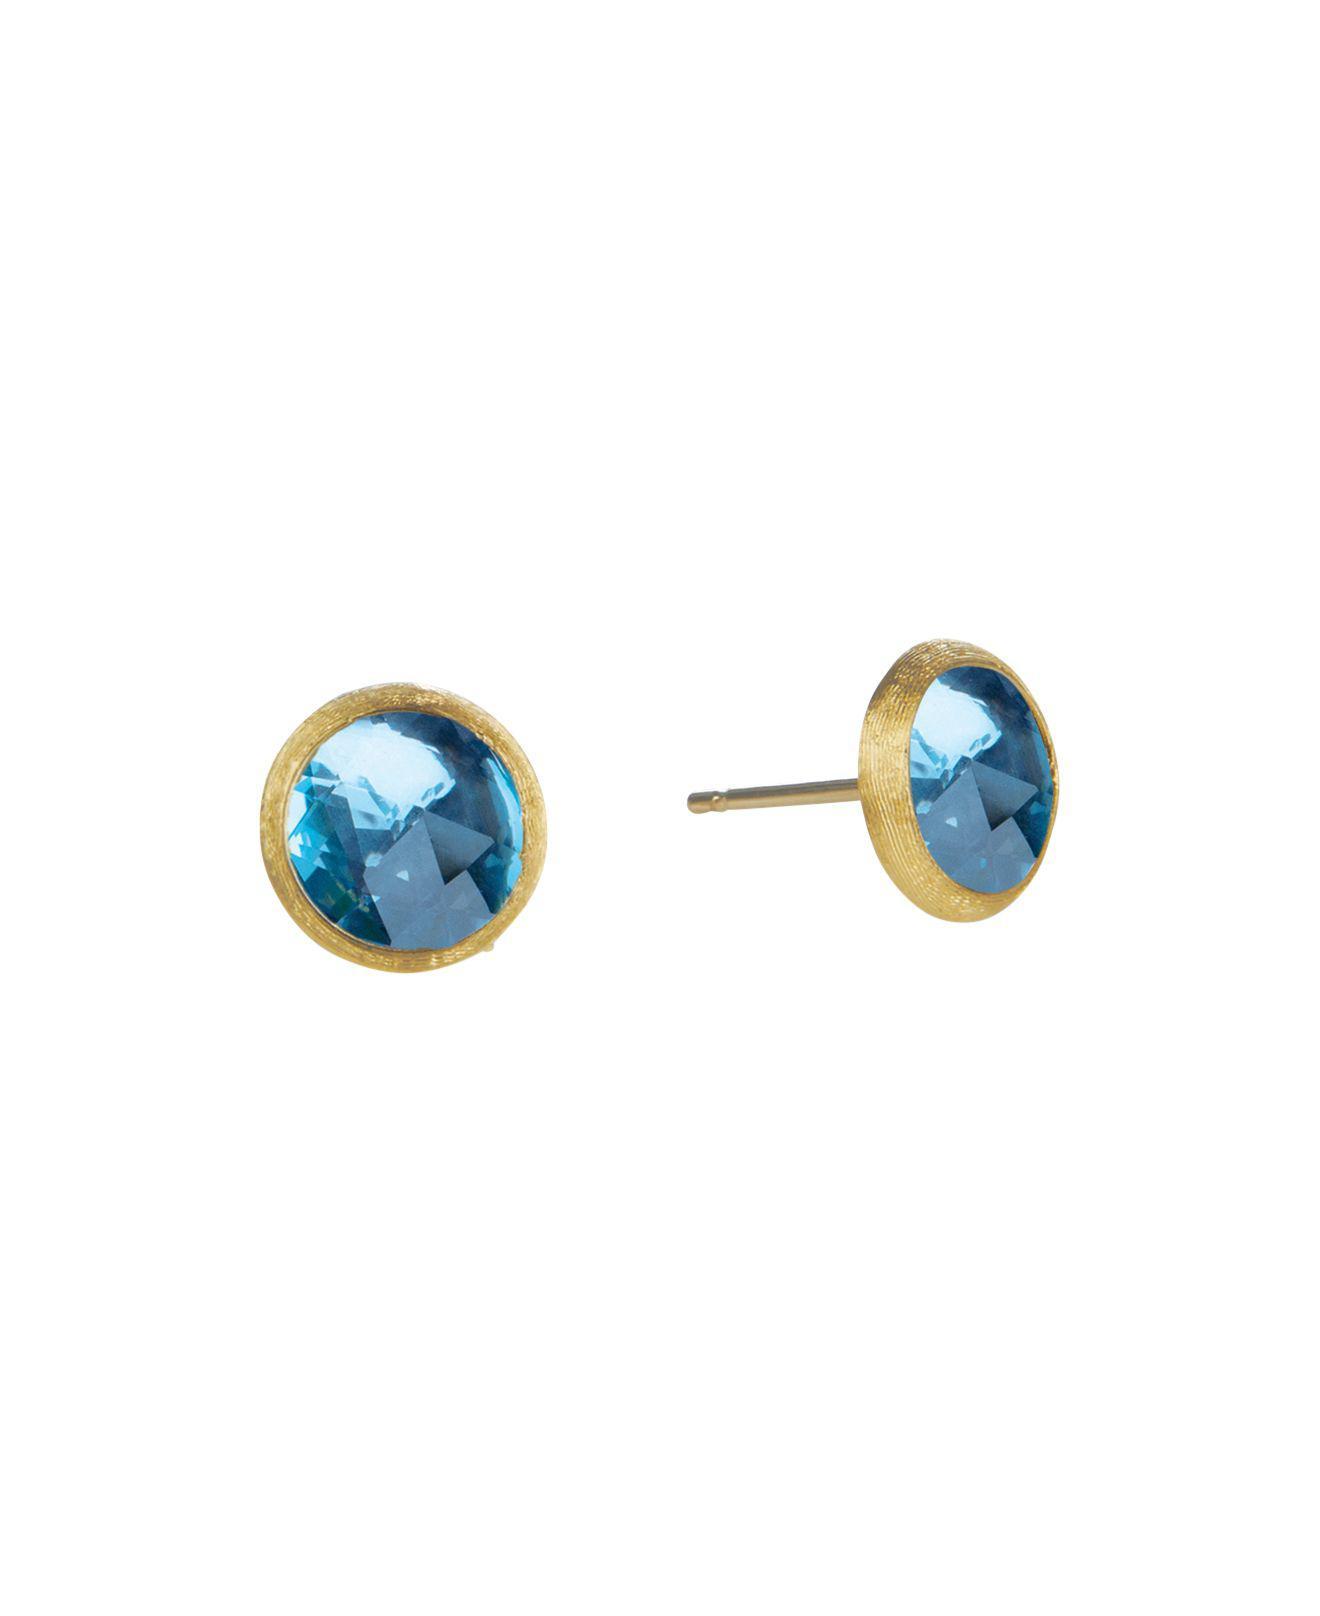 Marco Bicego Jaipur 18K Chalcedony Stud Earrings HfLtQW